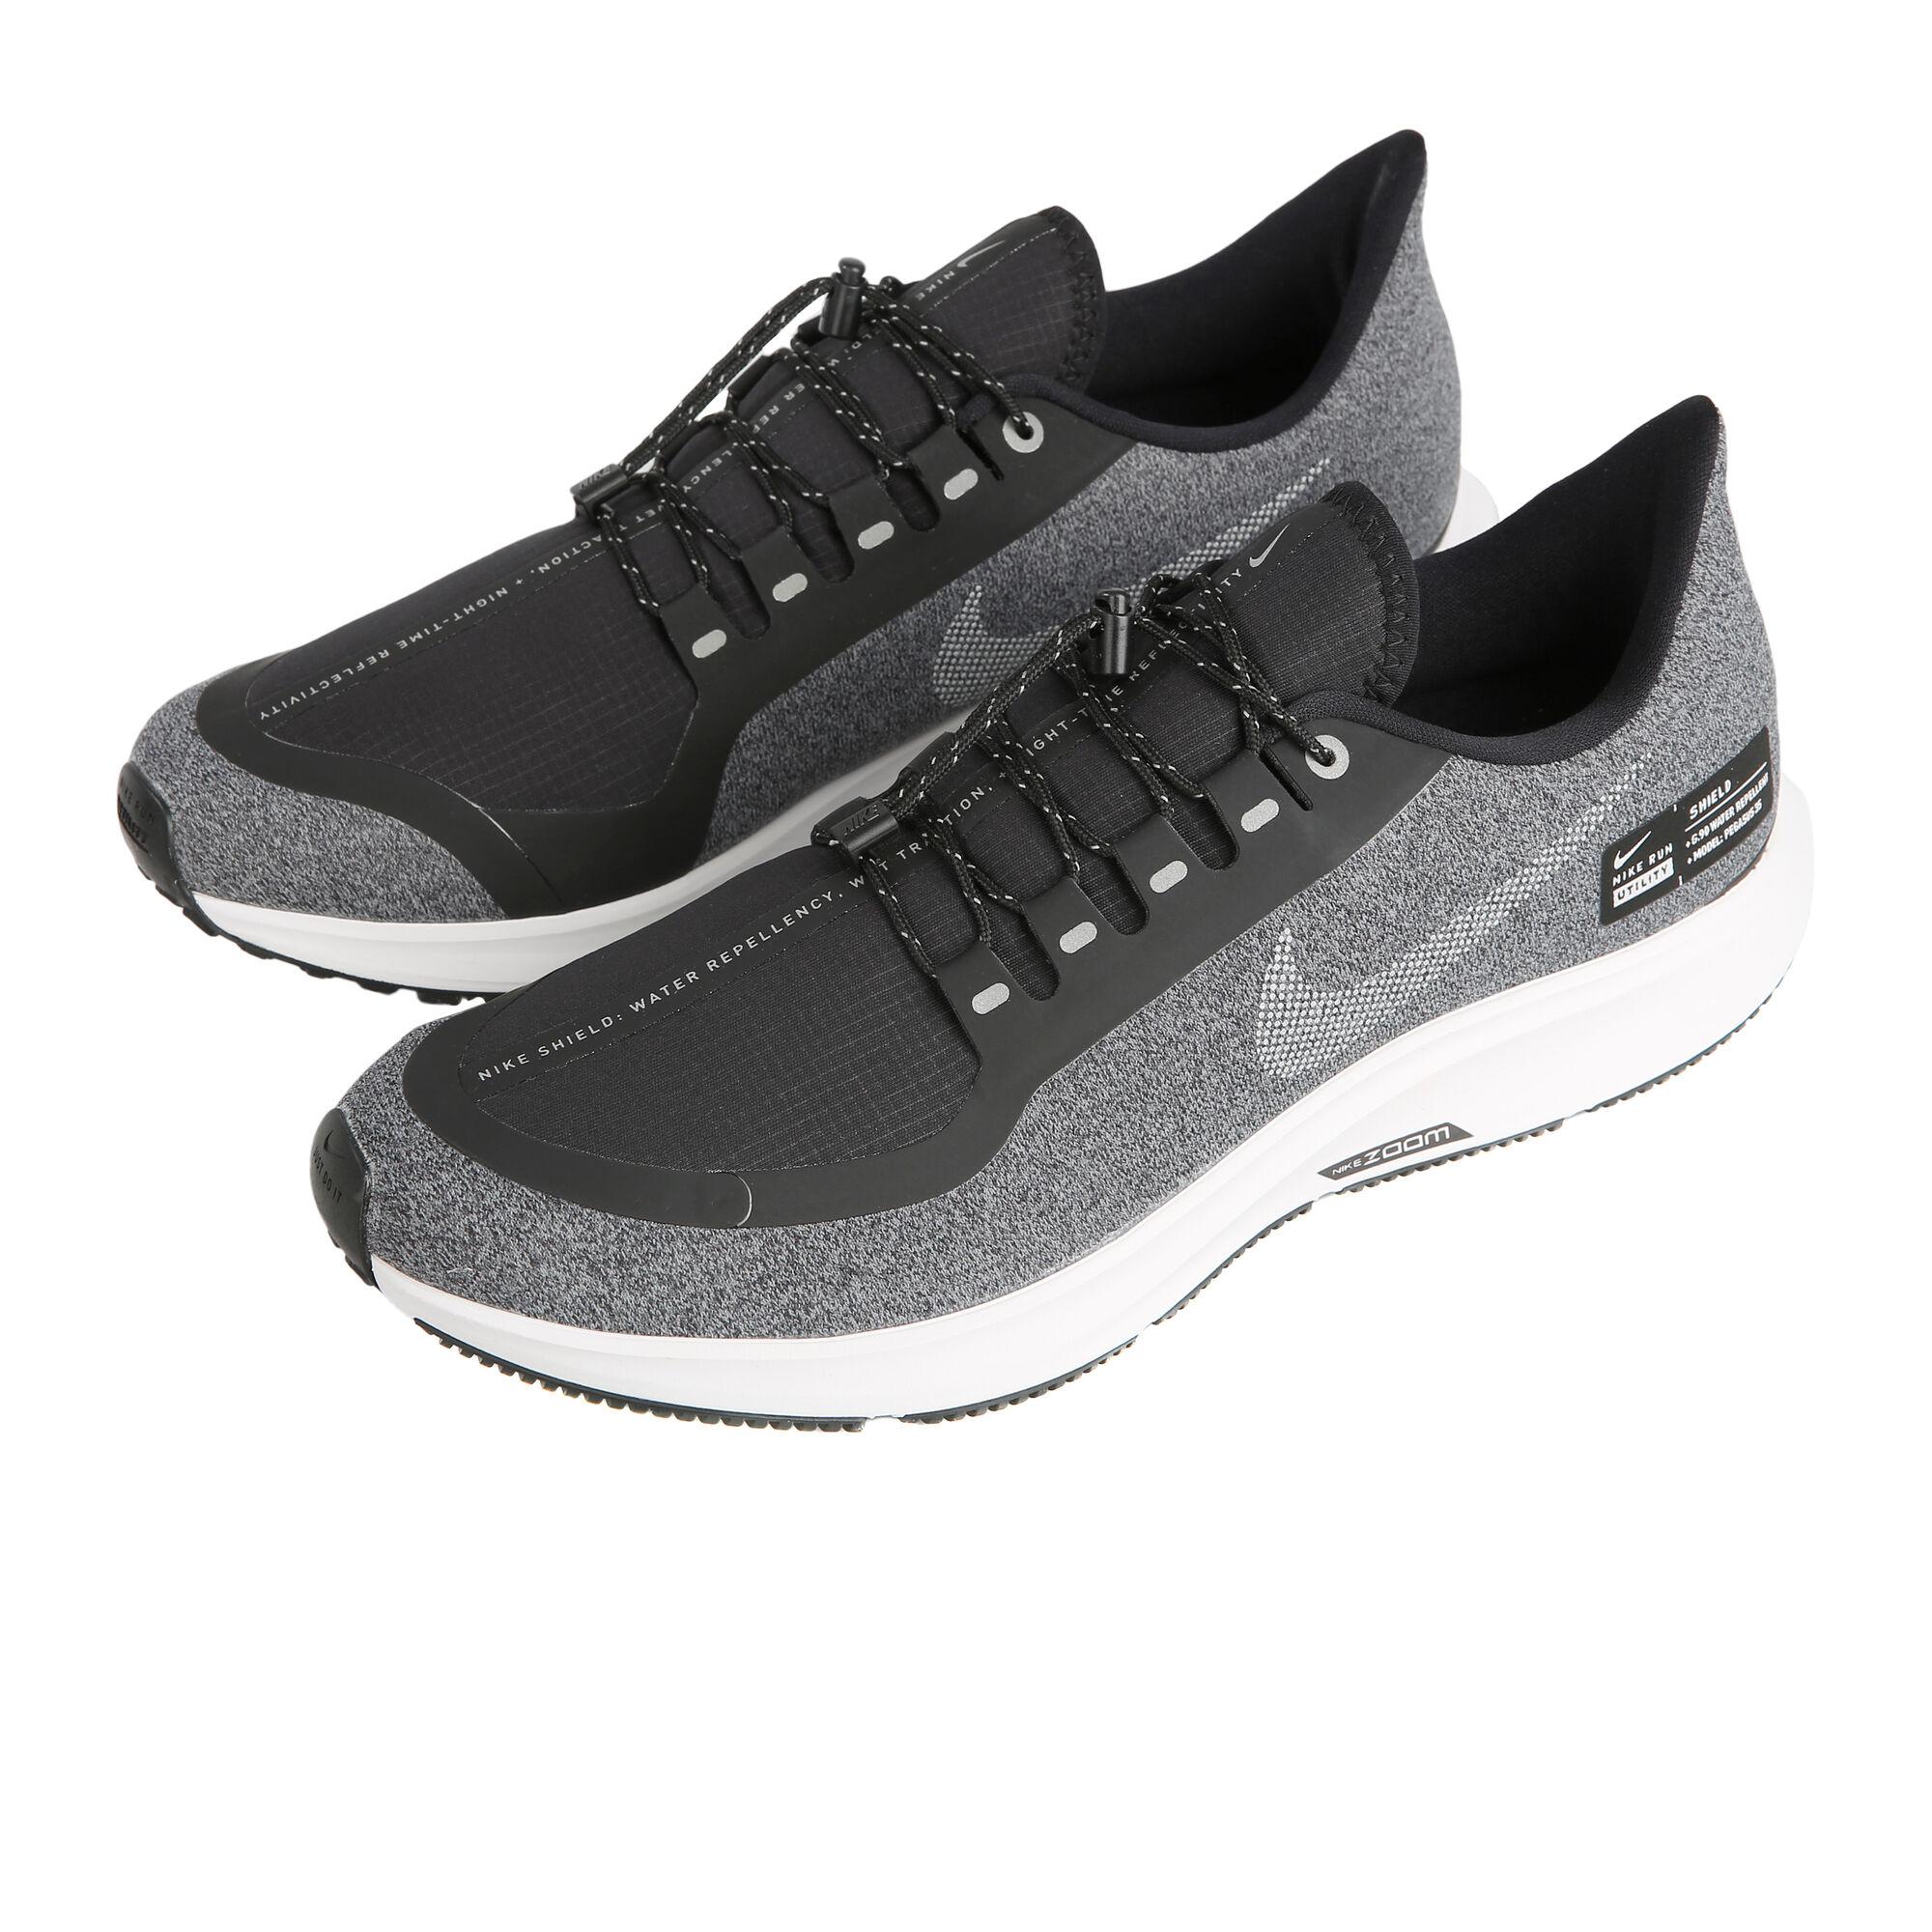 d2dcad75db3 Nike; Nike; Nike; Nike; Nike; Nike; Nike; Nike; Nike. Air Zoom Pegasus 35  Shield ...